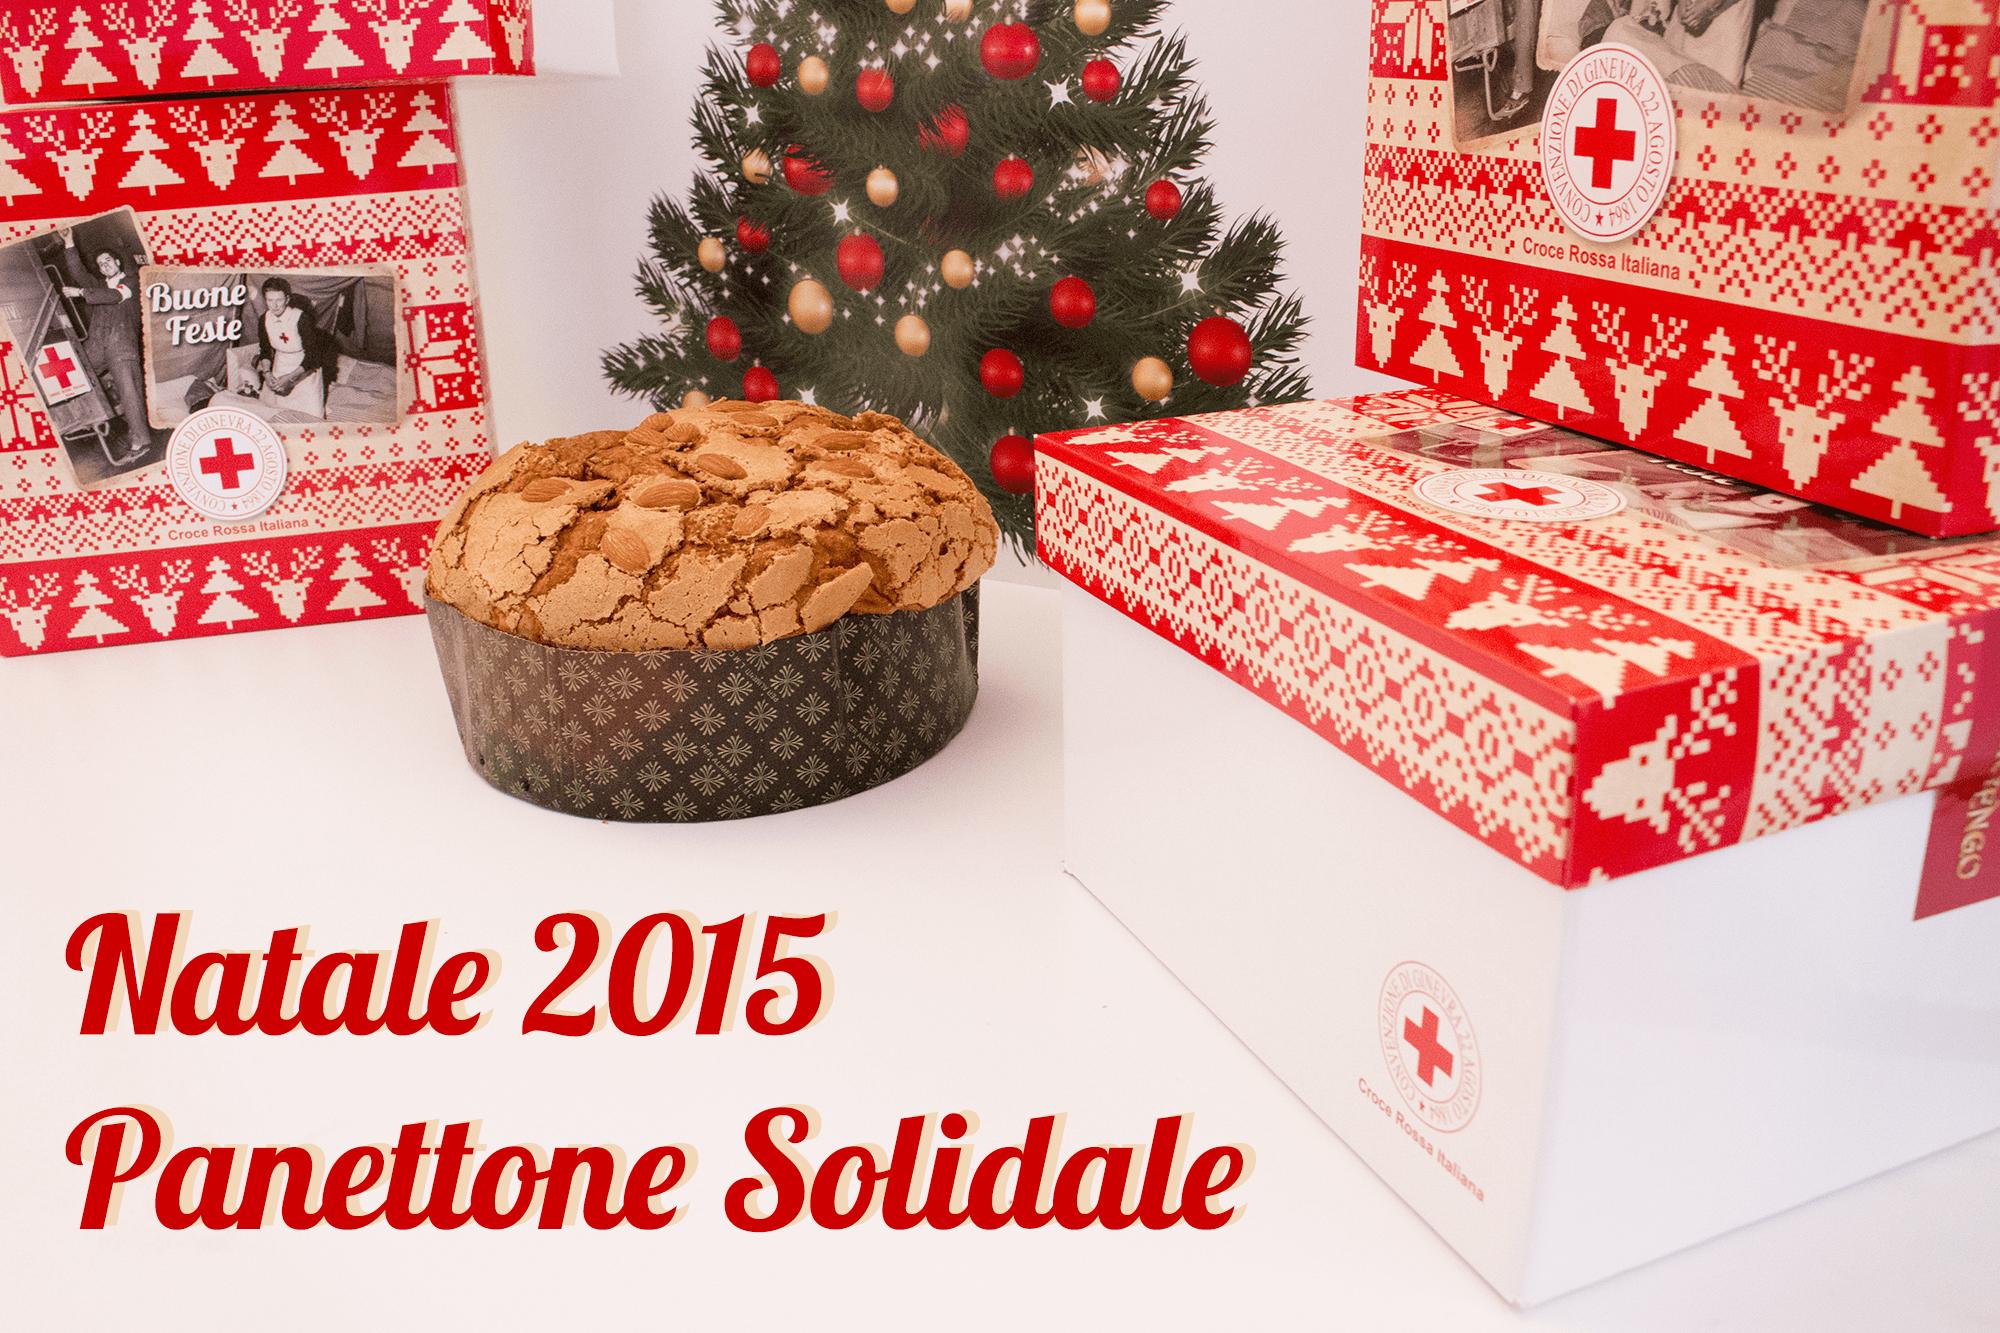 Panettone_Solidale_Croce_Rossa_Italiana_Natale_2015